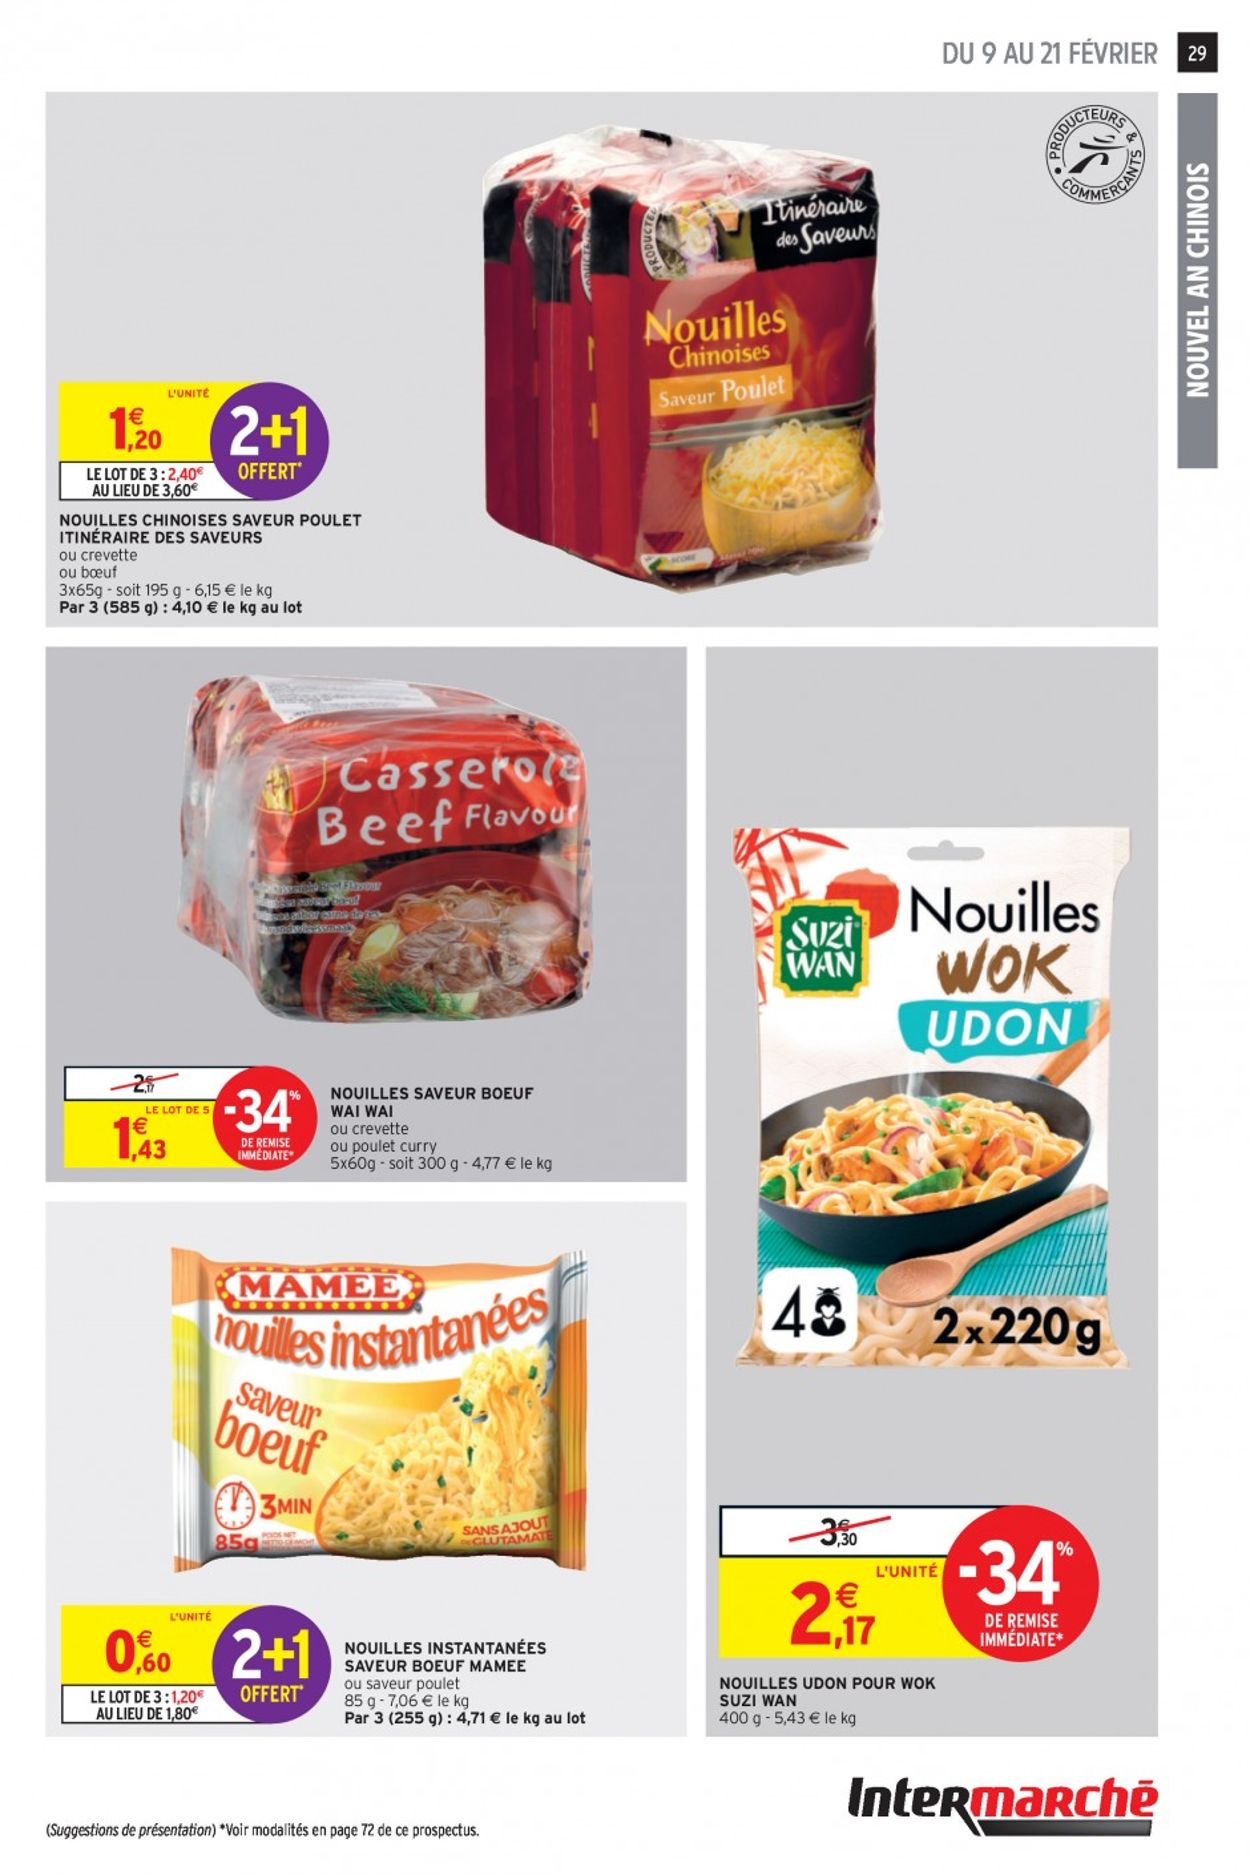 Intermarché Catalogue - 09.02-21.02.2021 (Page 29)